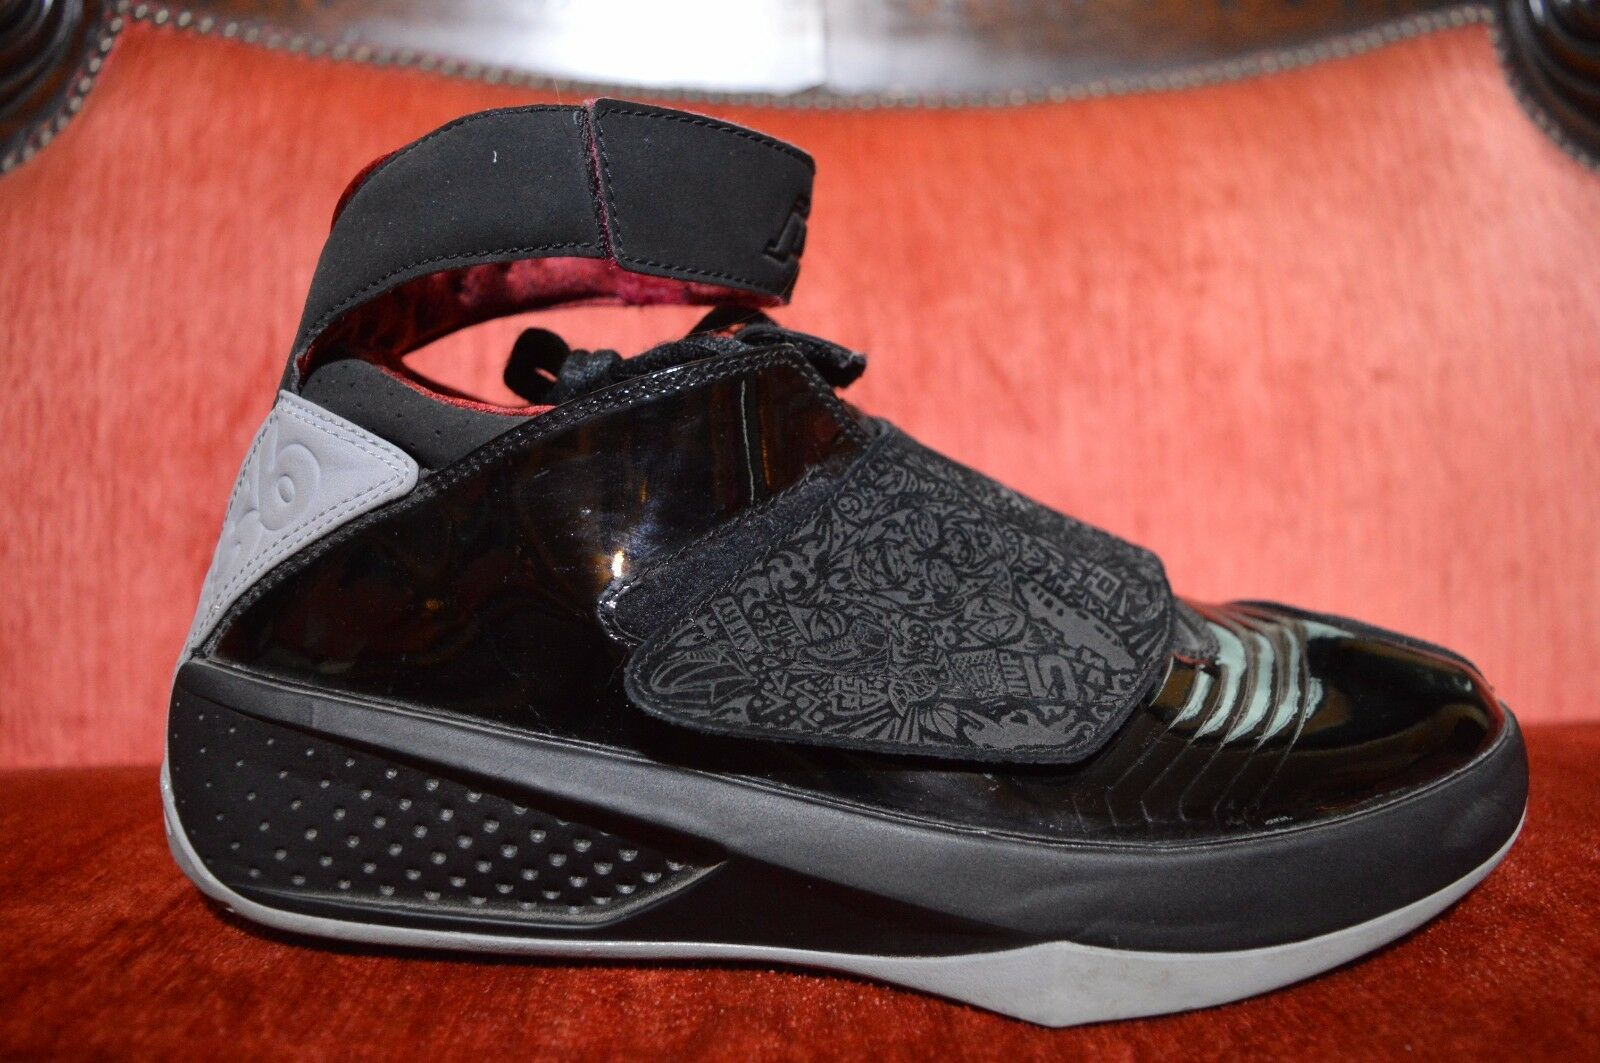 CLEAN Nike Air Jordan 20 XX Stealth Black laser OG 2005 size 9 310455 001